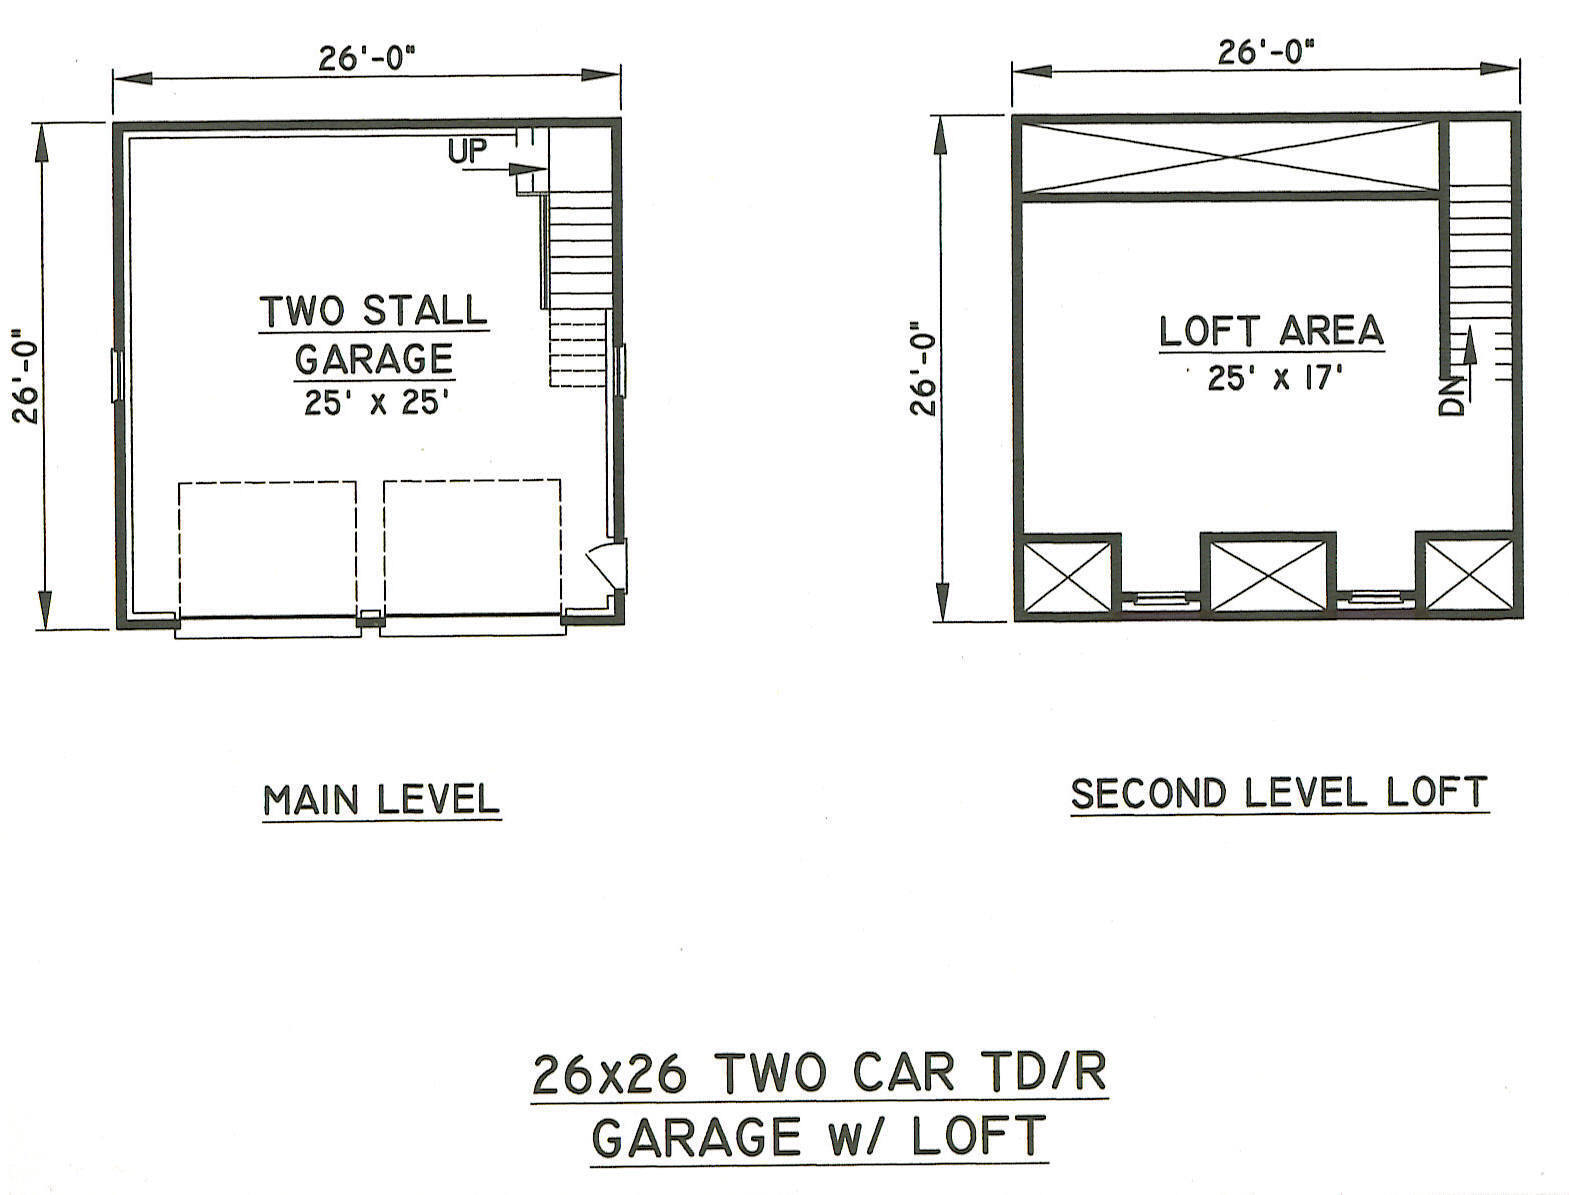 26x26 2 Car Tdormer Rd Garage Building Blueprint Plans